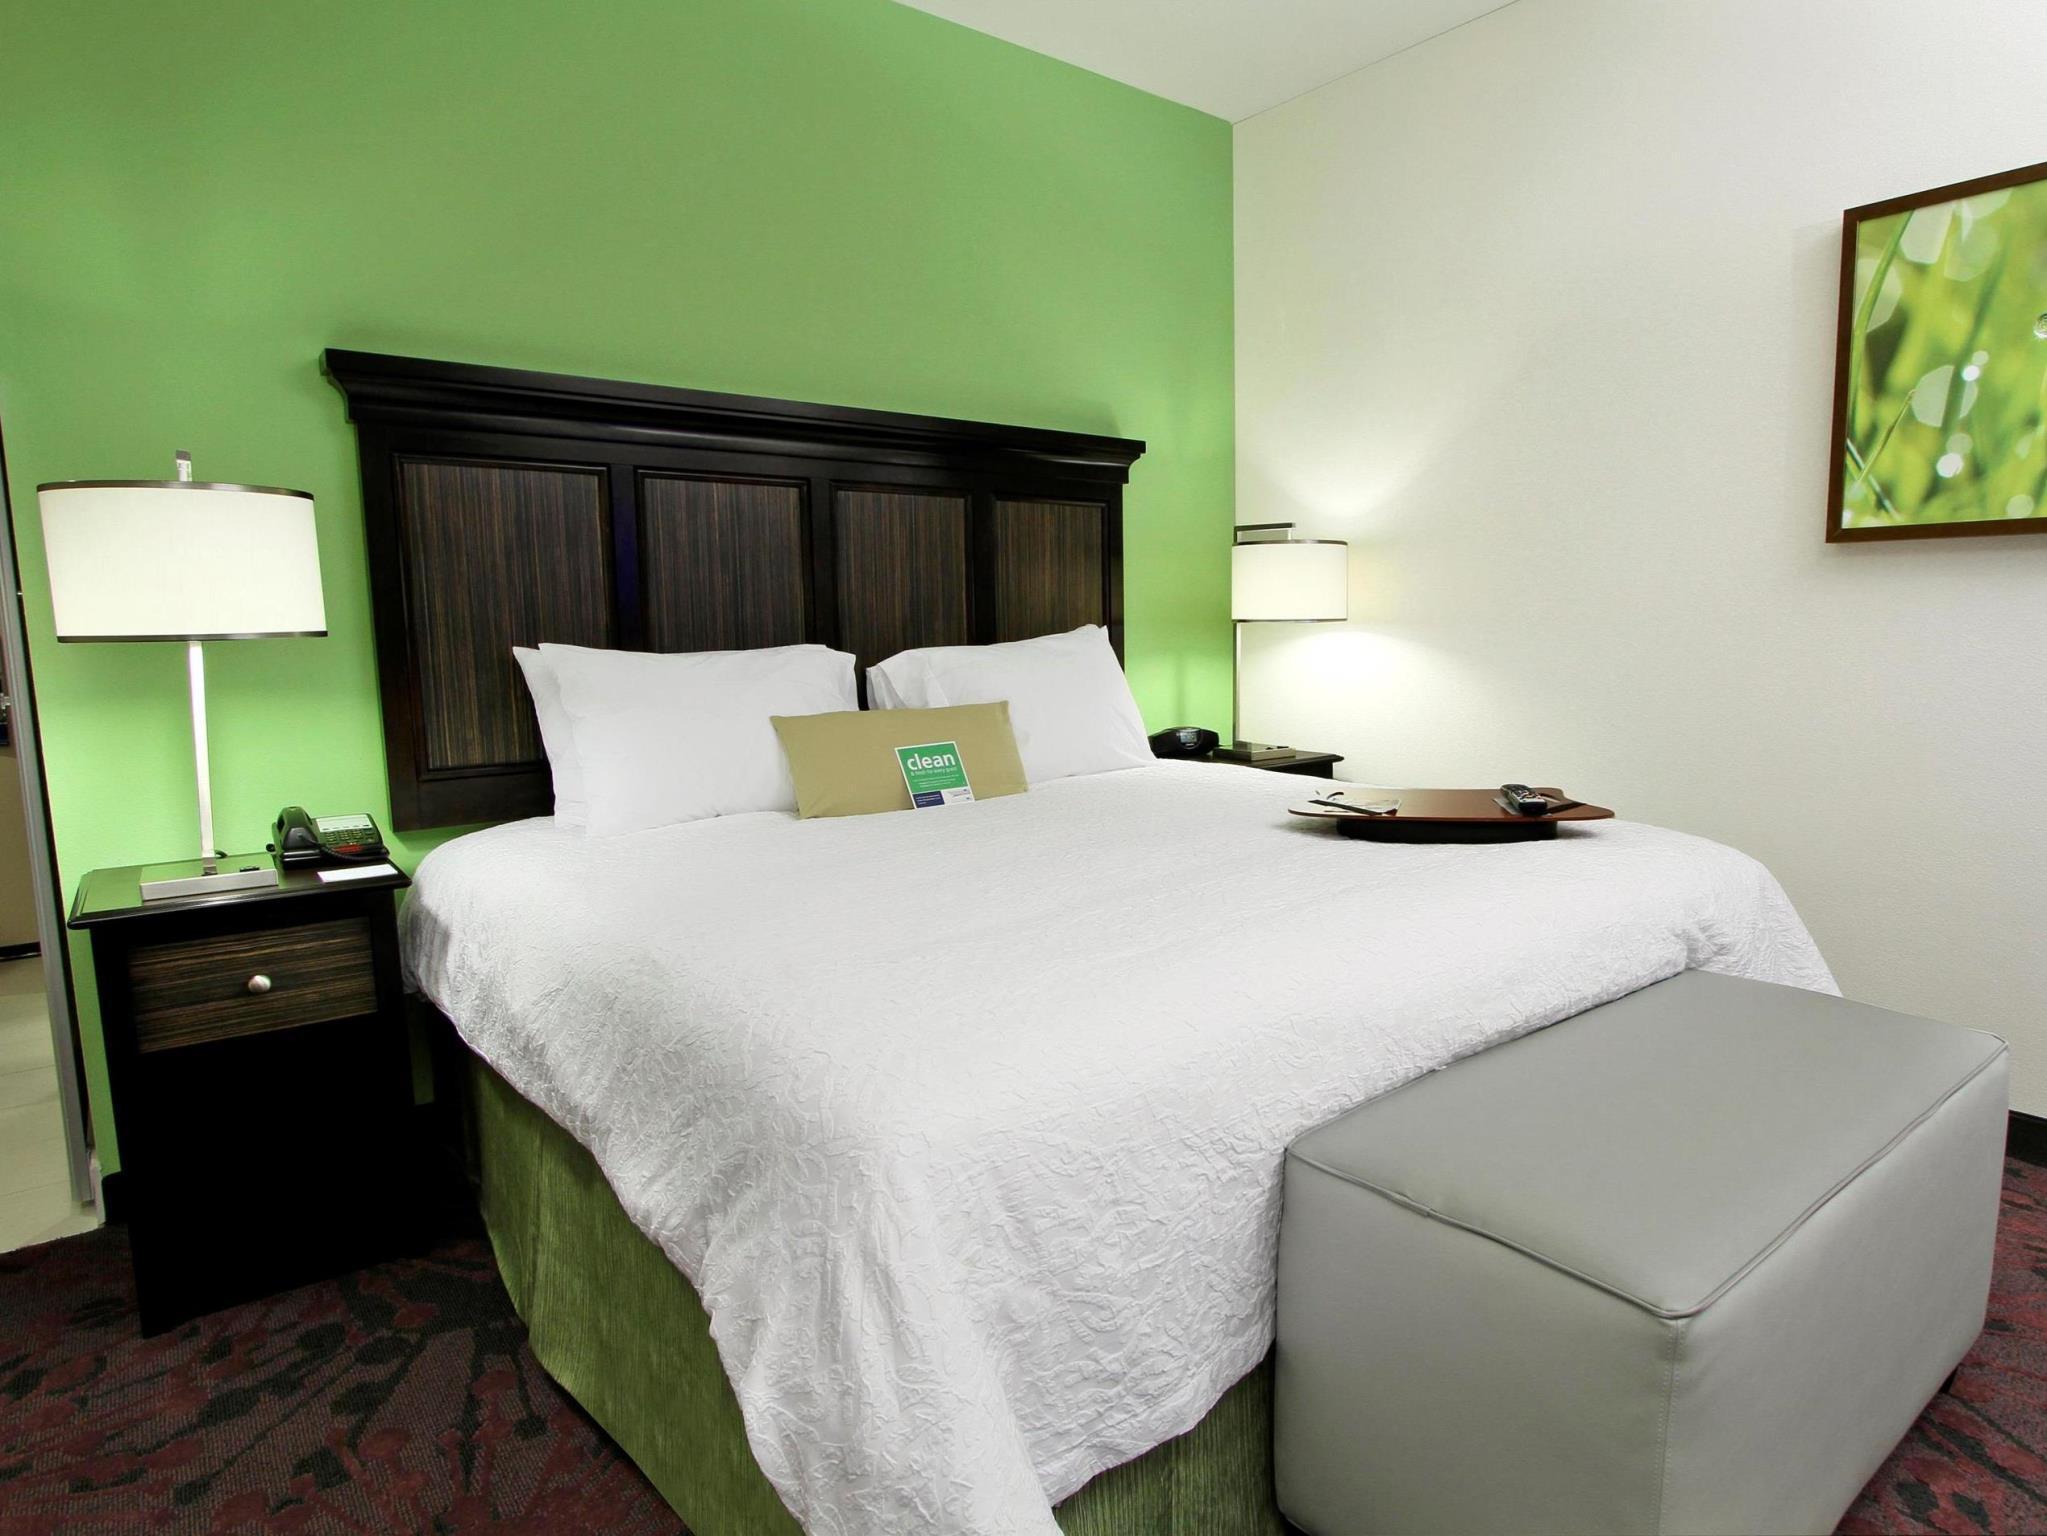 Hampton Inn And Suites Winnie Reviews